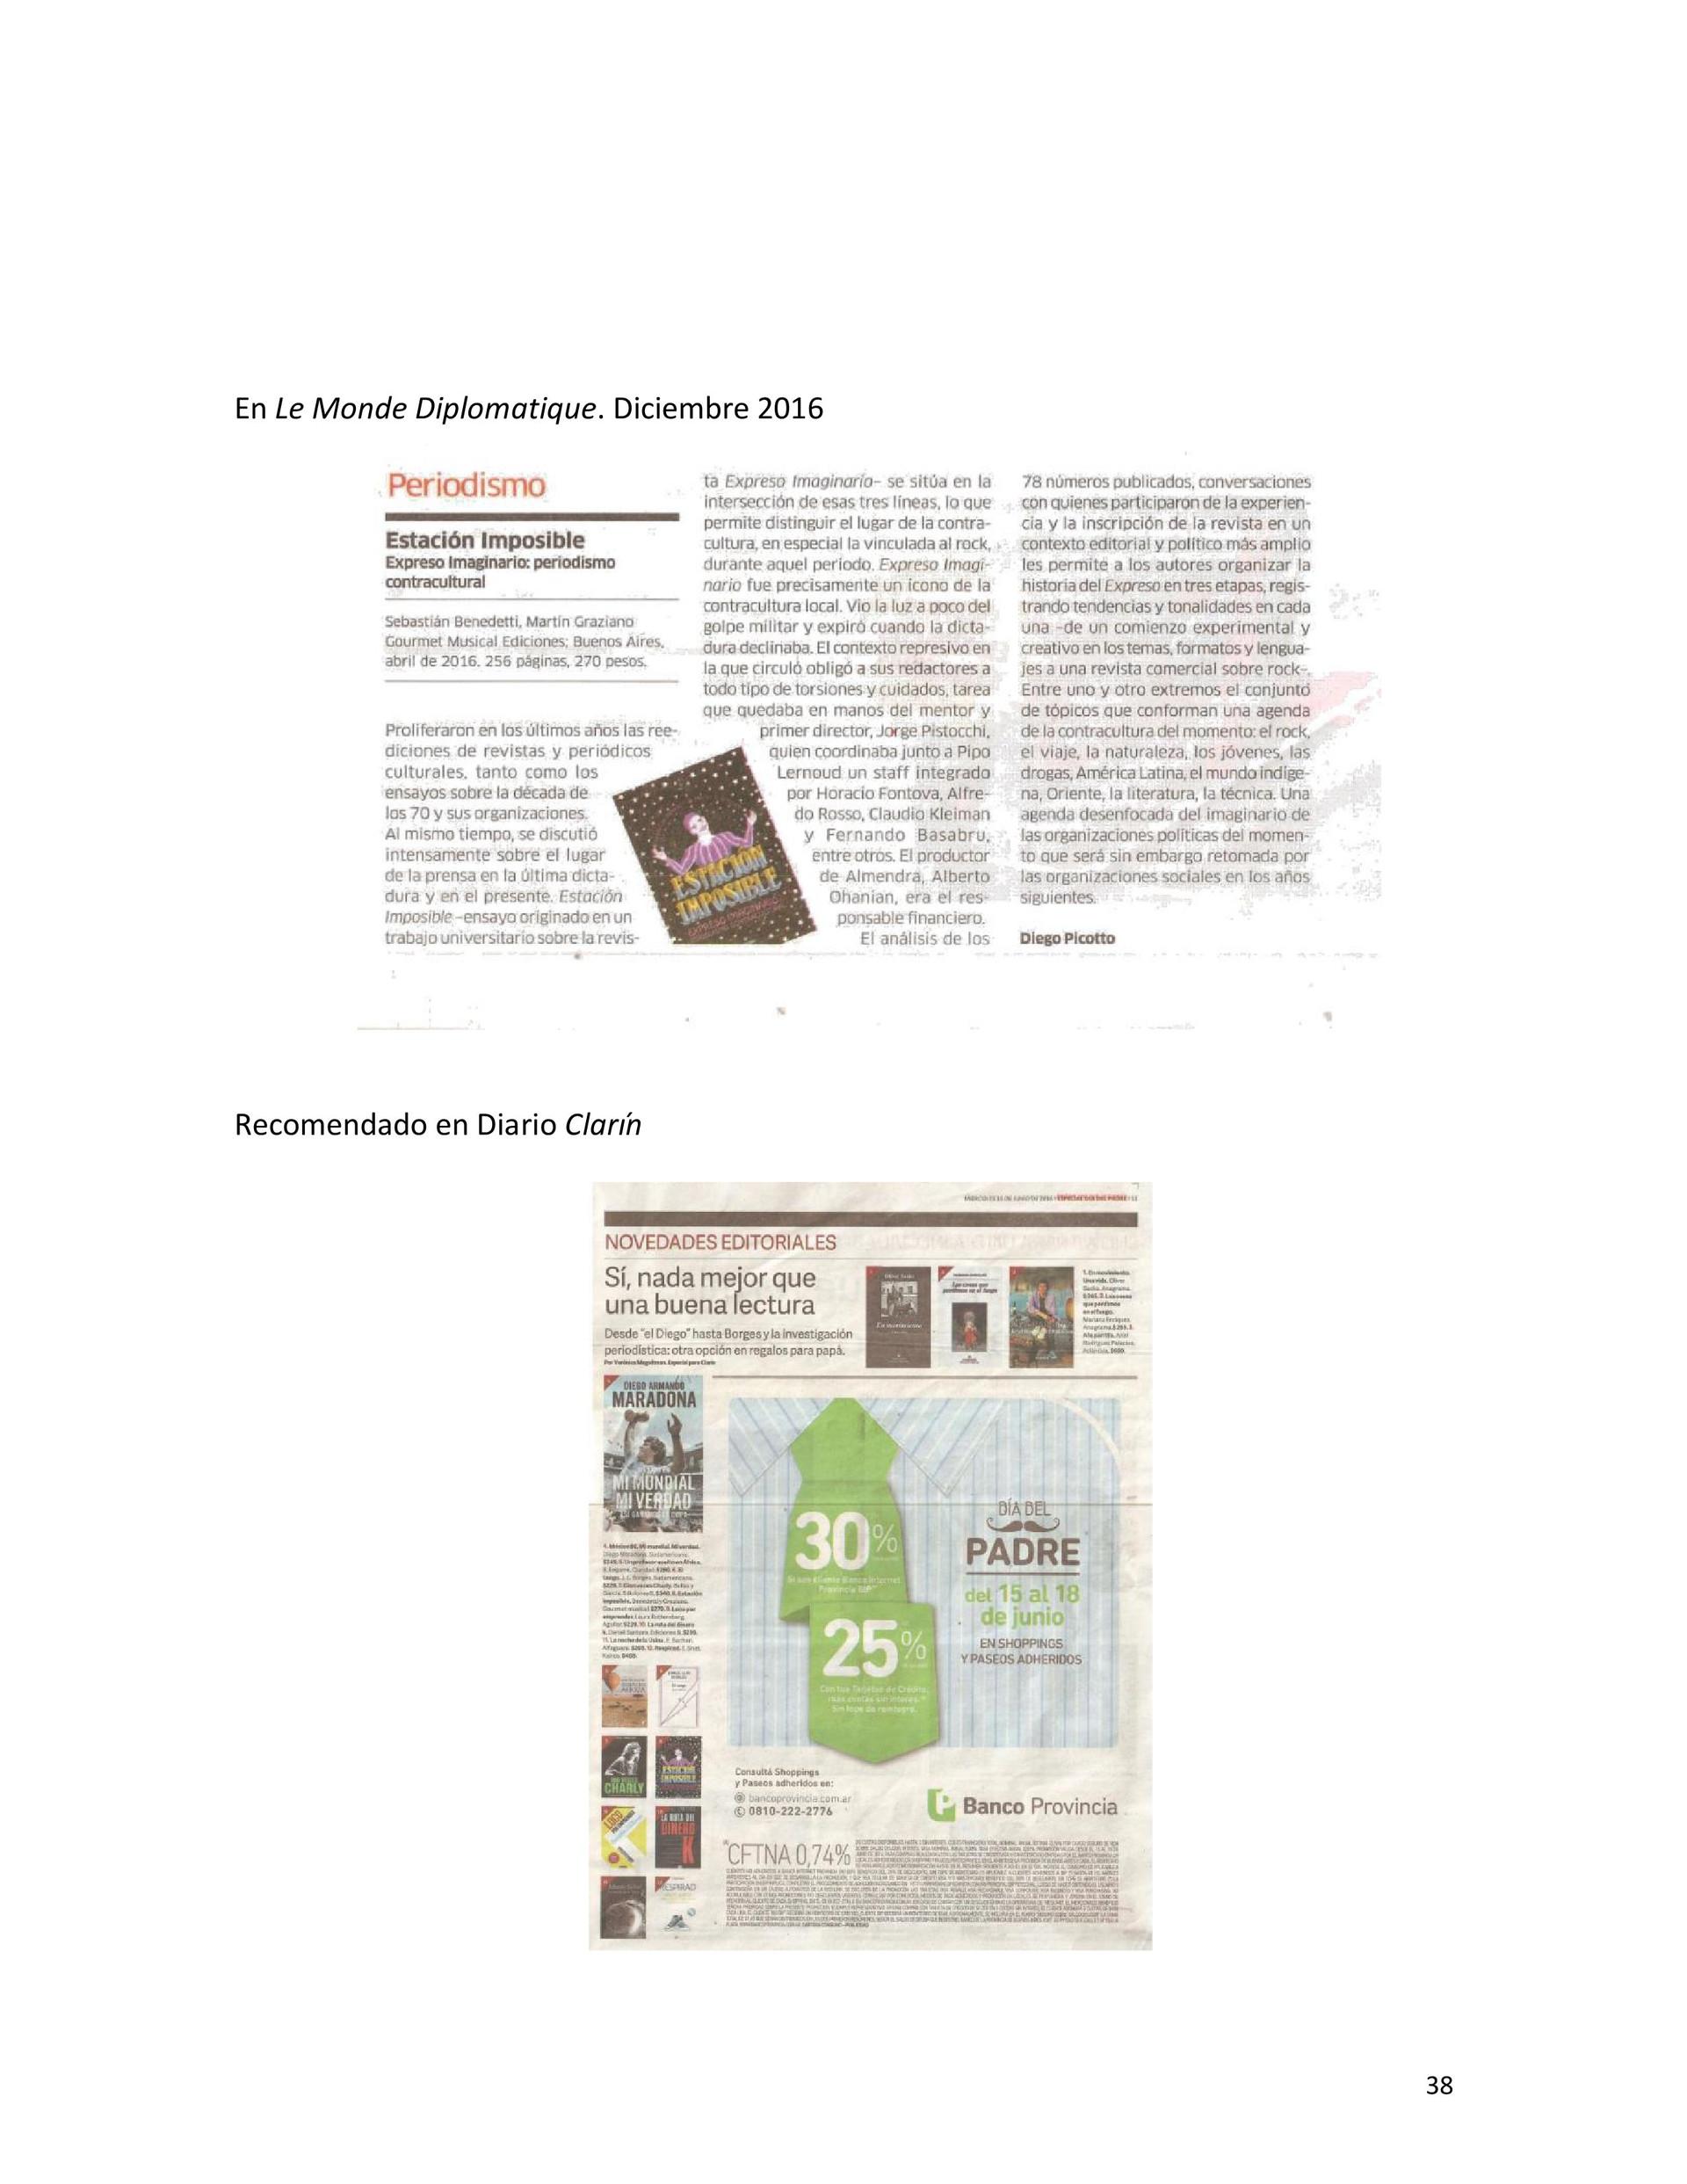 estacion_Page_37.jpeg